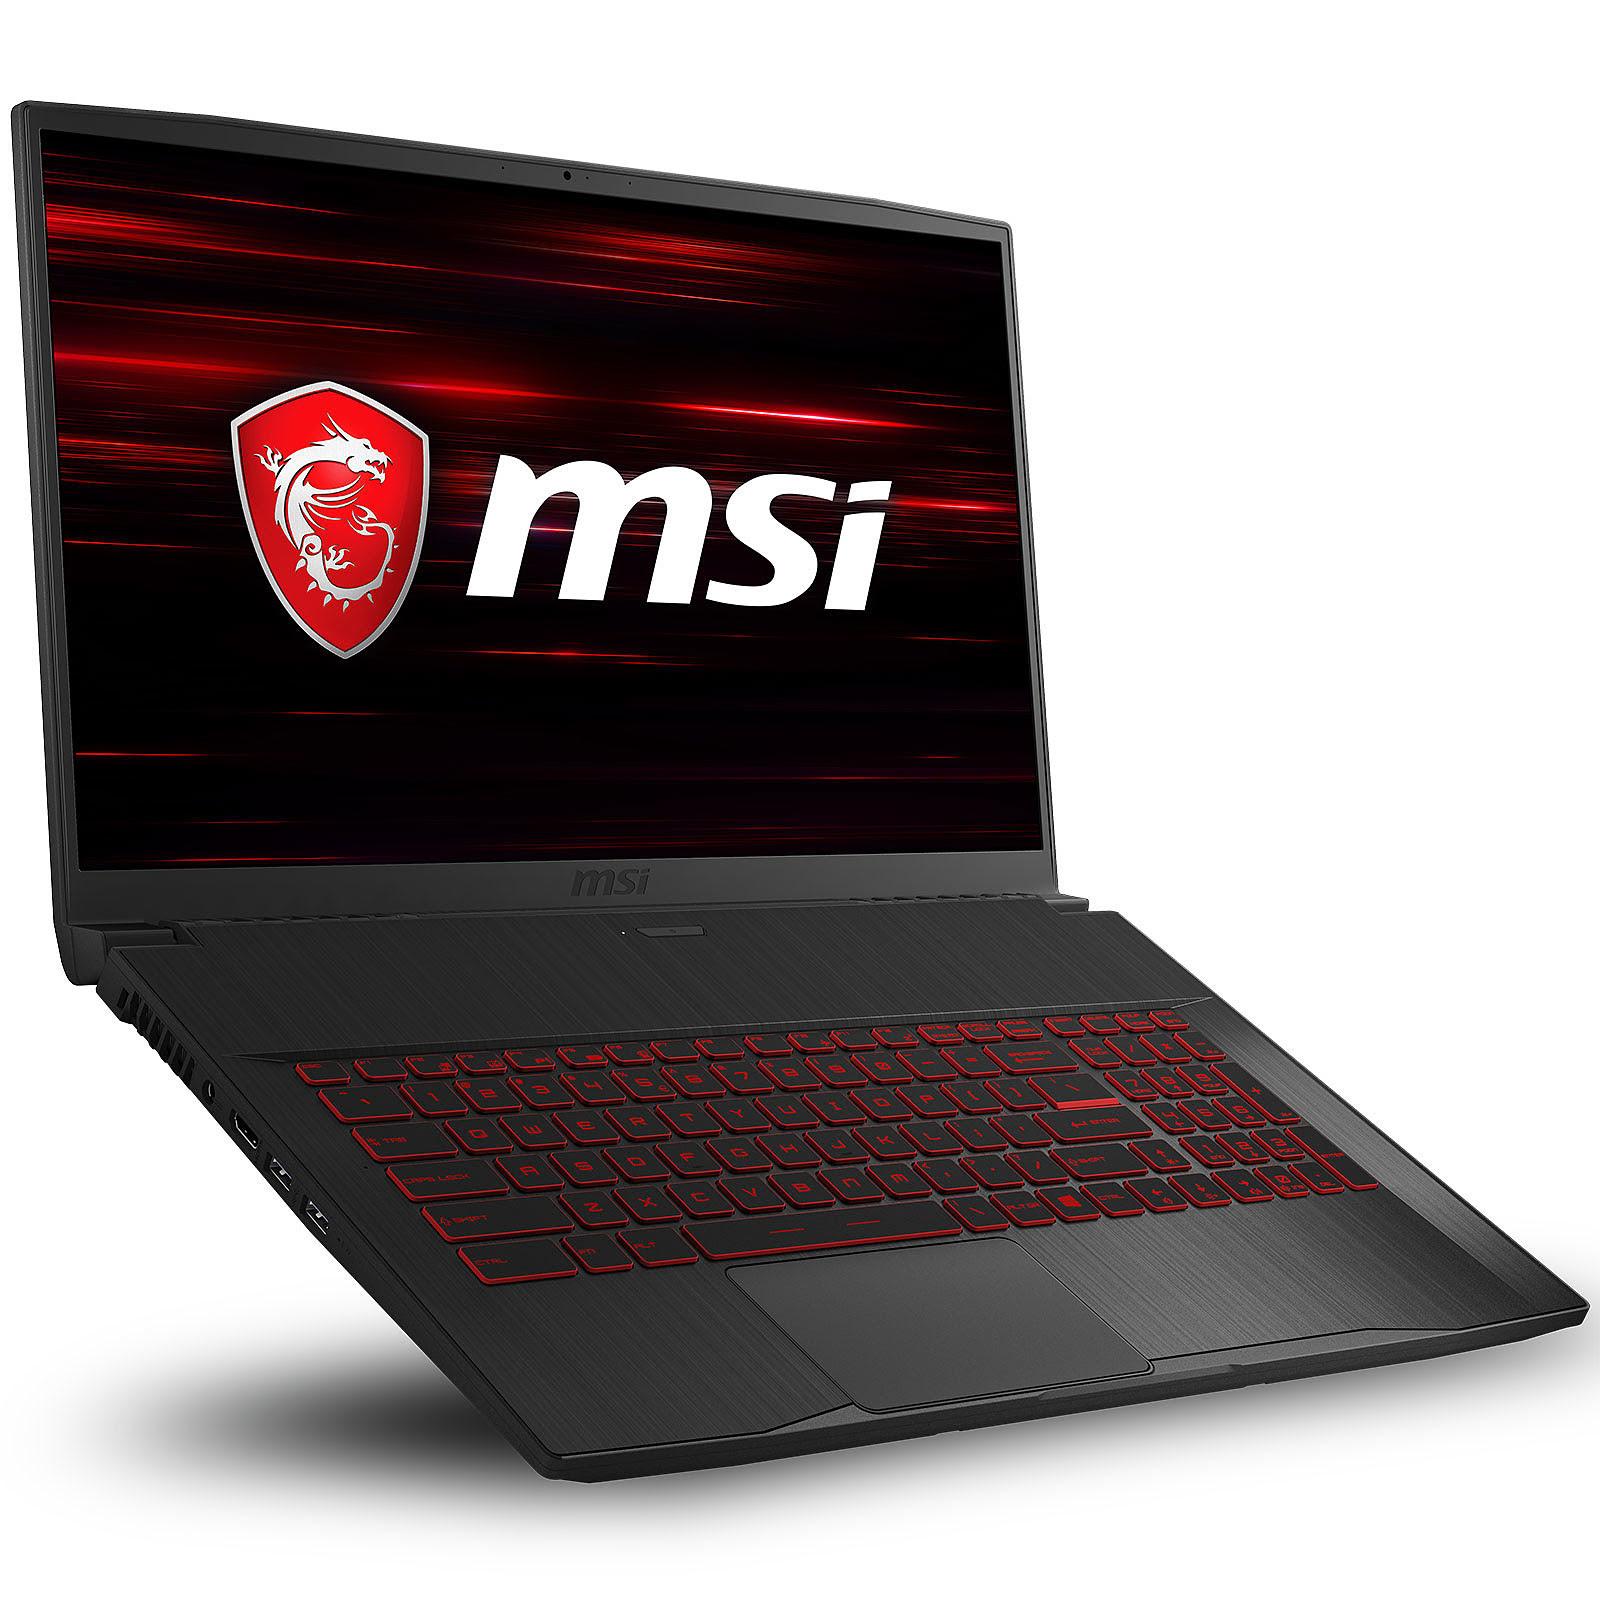 MSI 9S7-17F312-286 - PC portable MSI - Cybertek.fr - 0